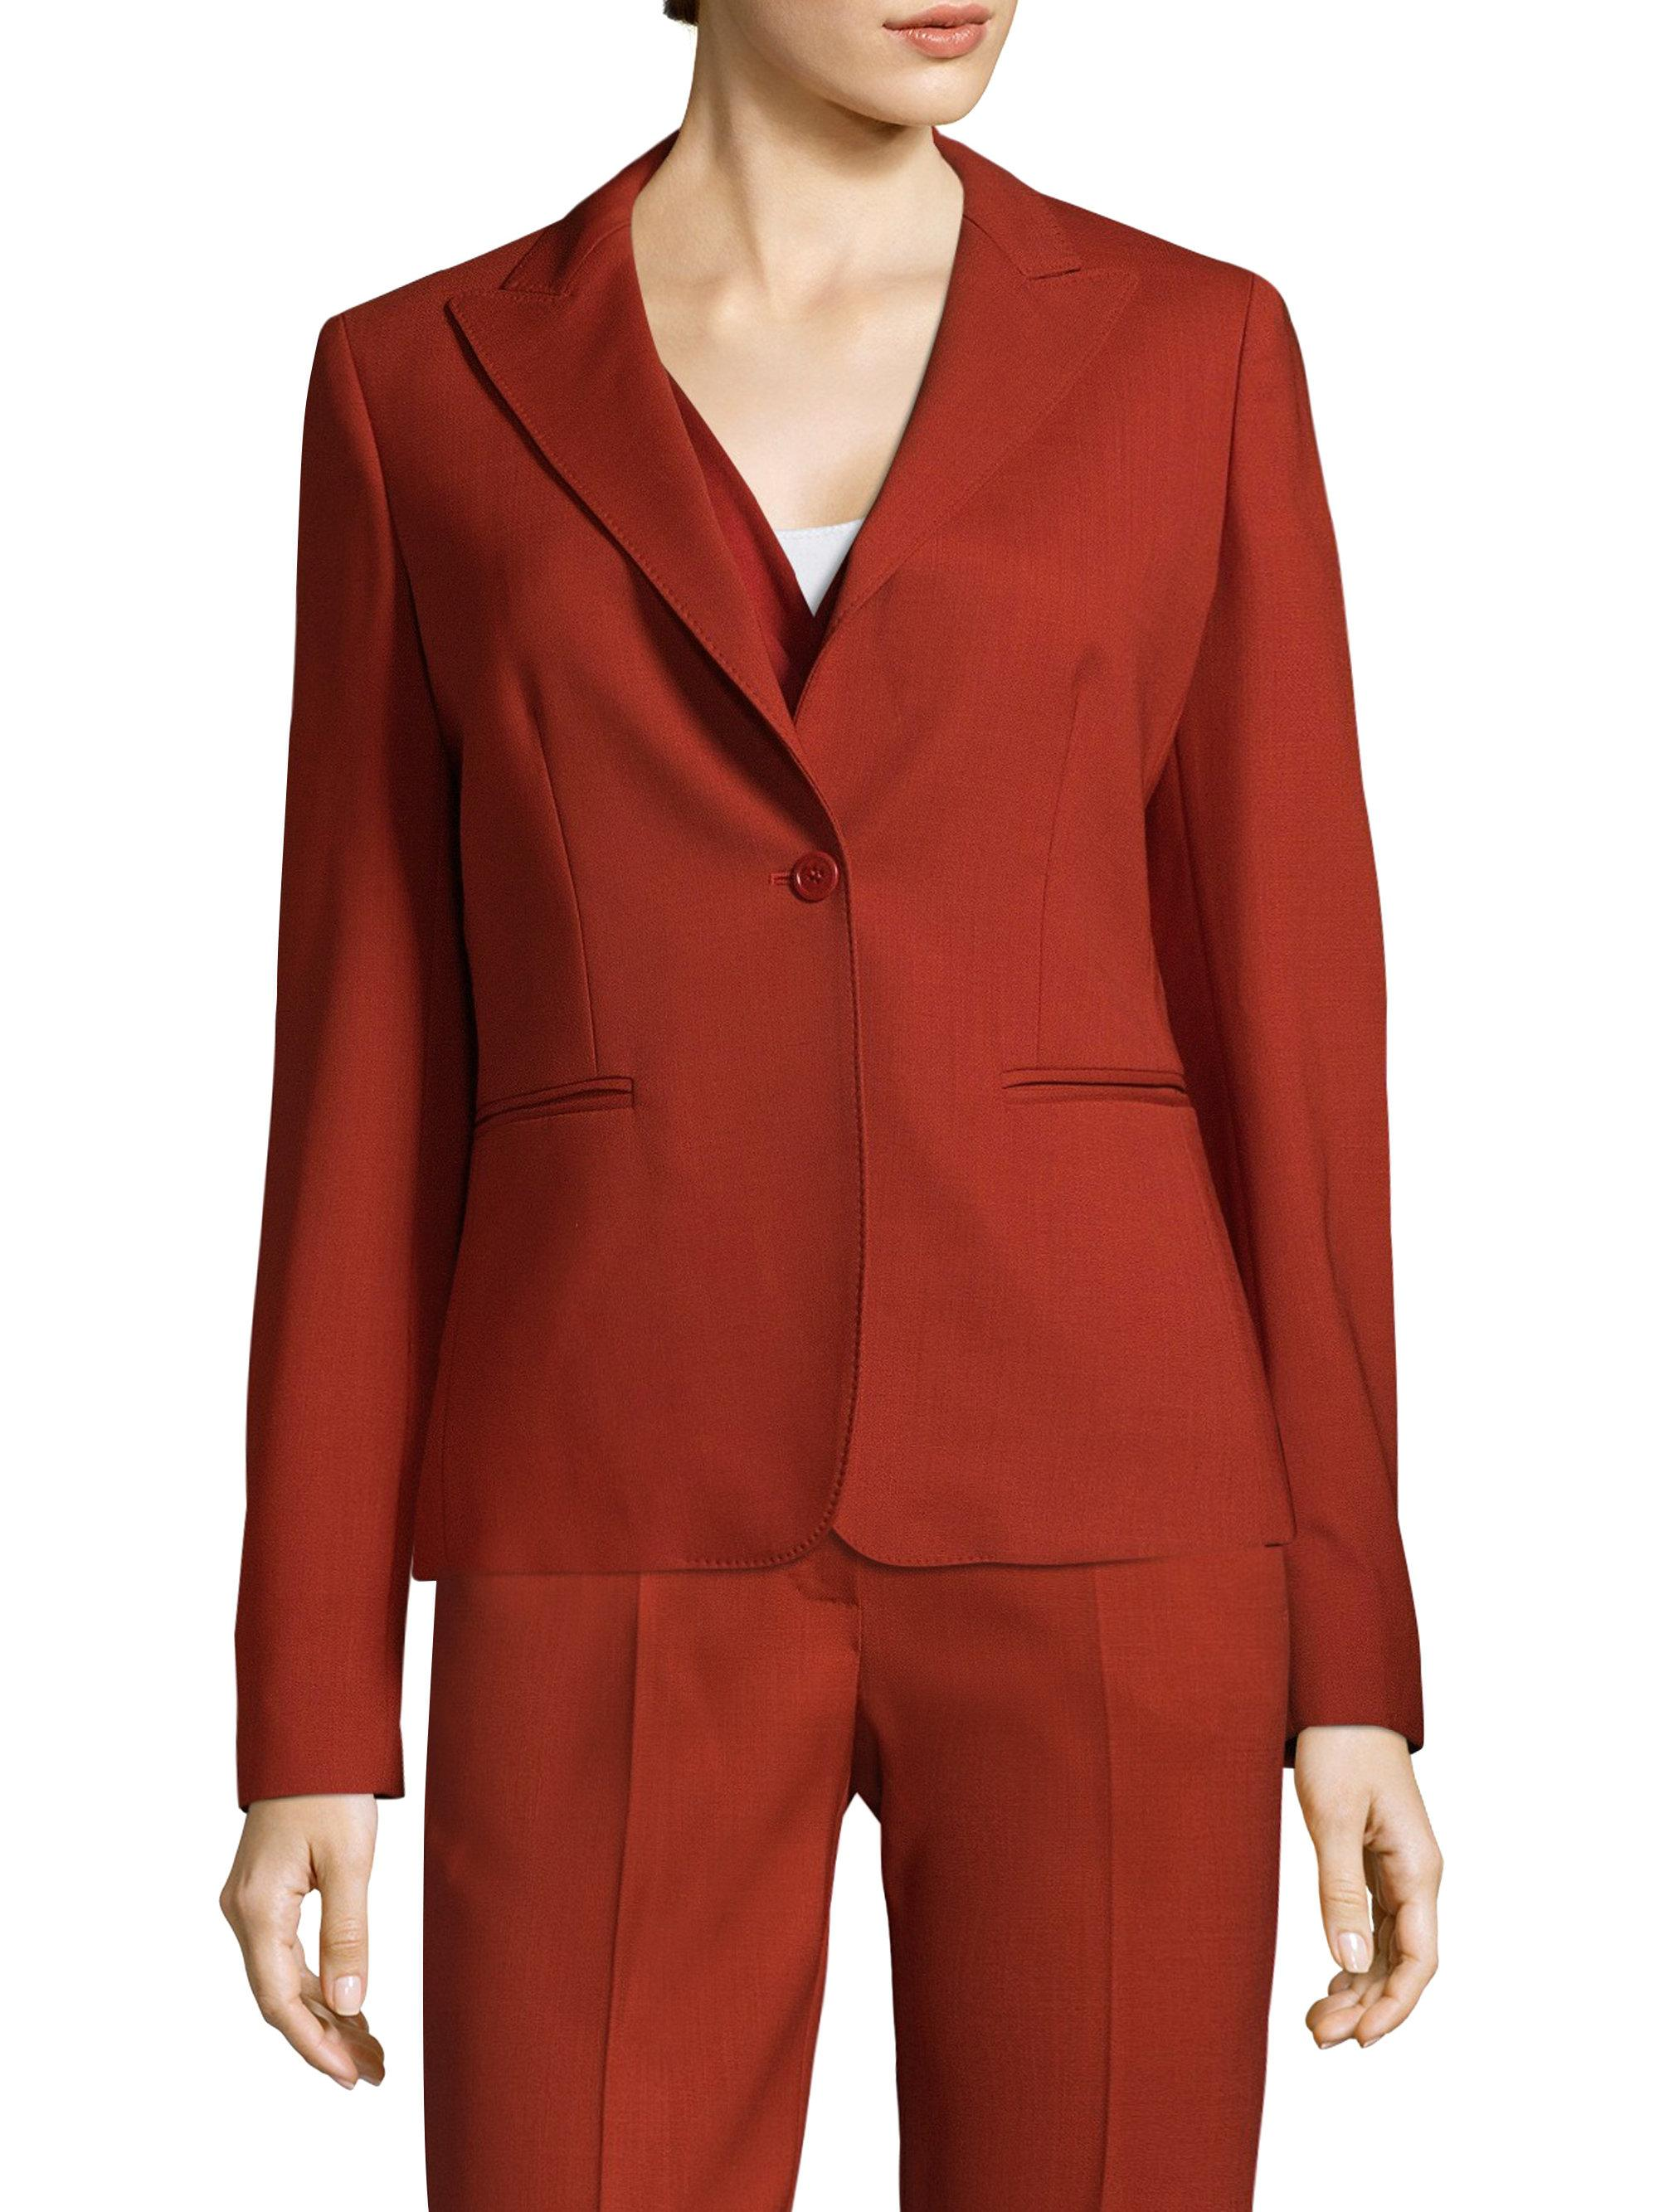 Cheap Sale Purchase MaxMara Notch-Lapel Wool Jacket Shopping Online Sale Online Buy Cheap Recommend qTSJsSjoQi